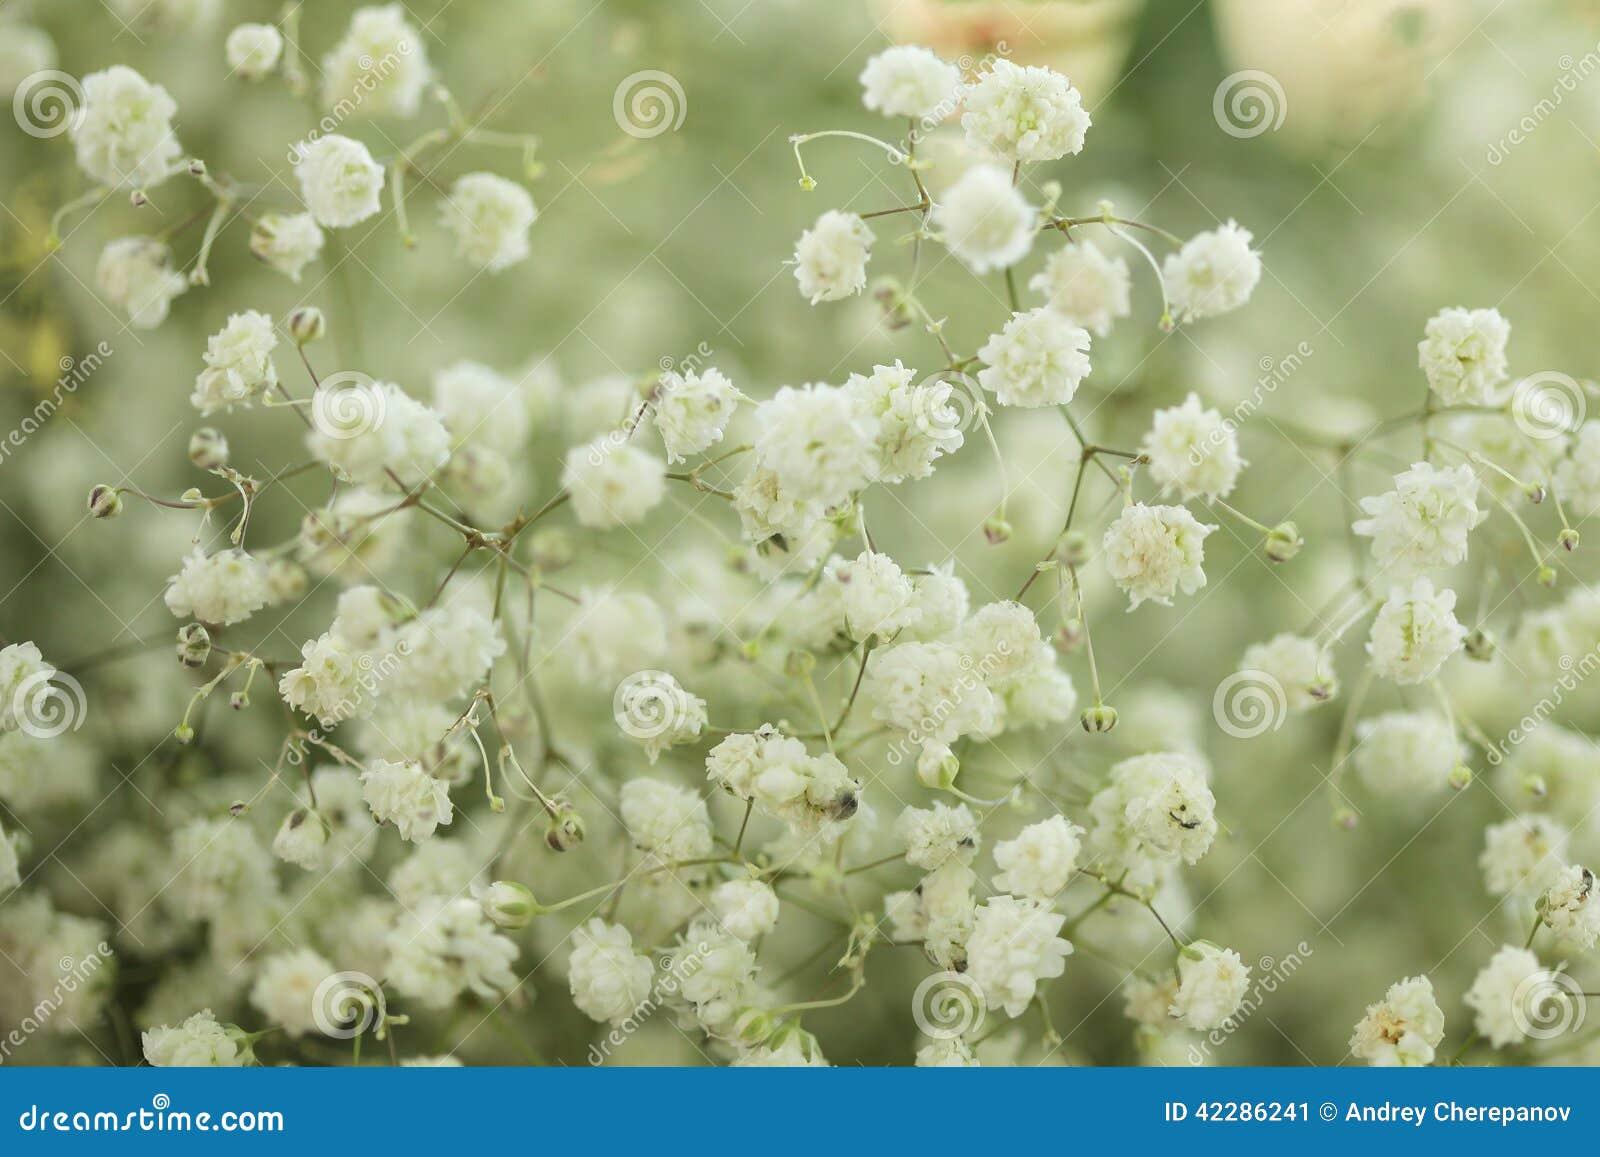 Unusual Beautiful White Flowers Background Stock Image Image Of